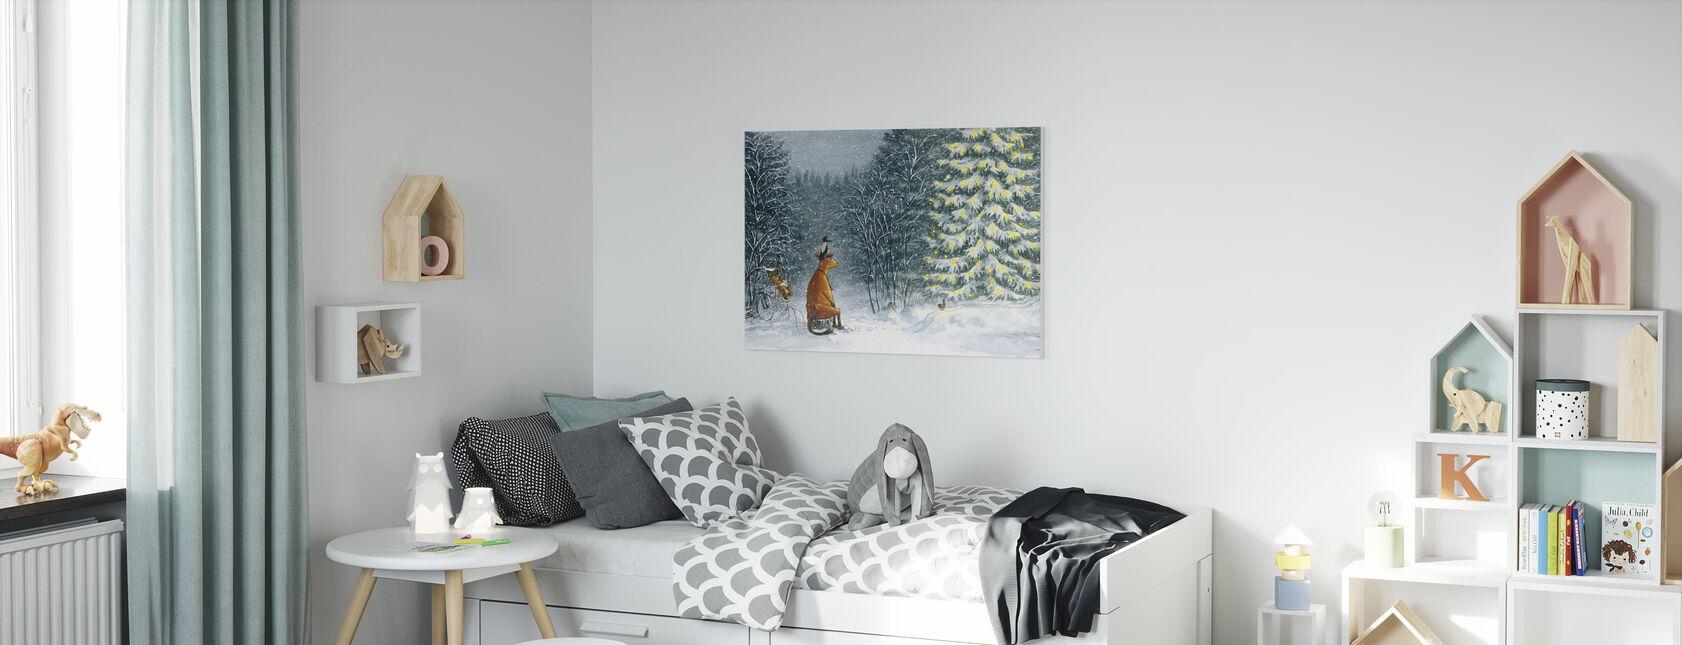 Mamma Mu & Kråkan - Mamma Mu & Kråkans jul - Canvastavla - Barnrum